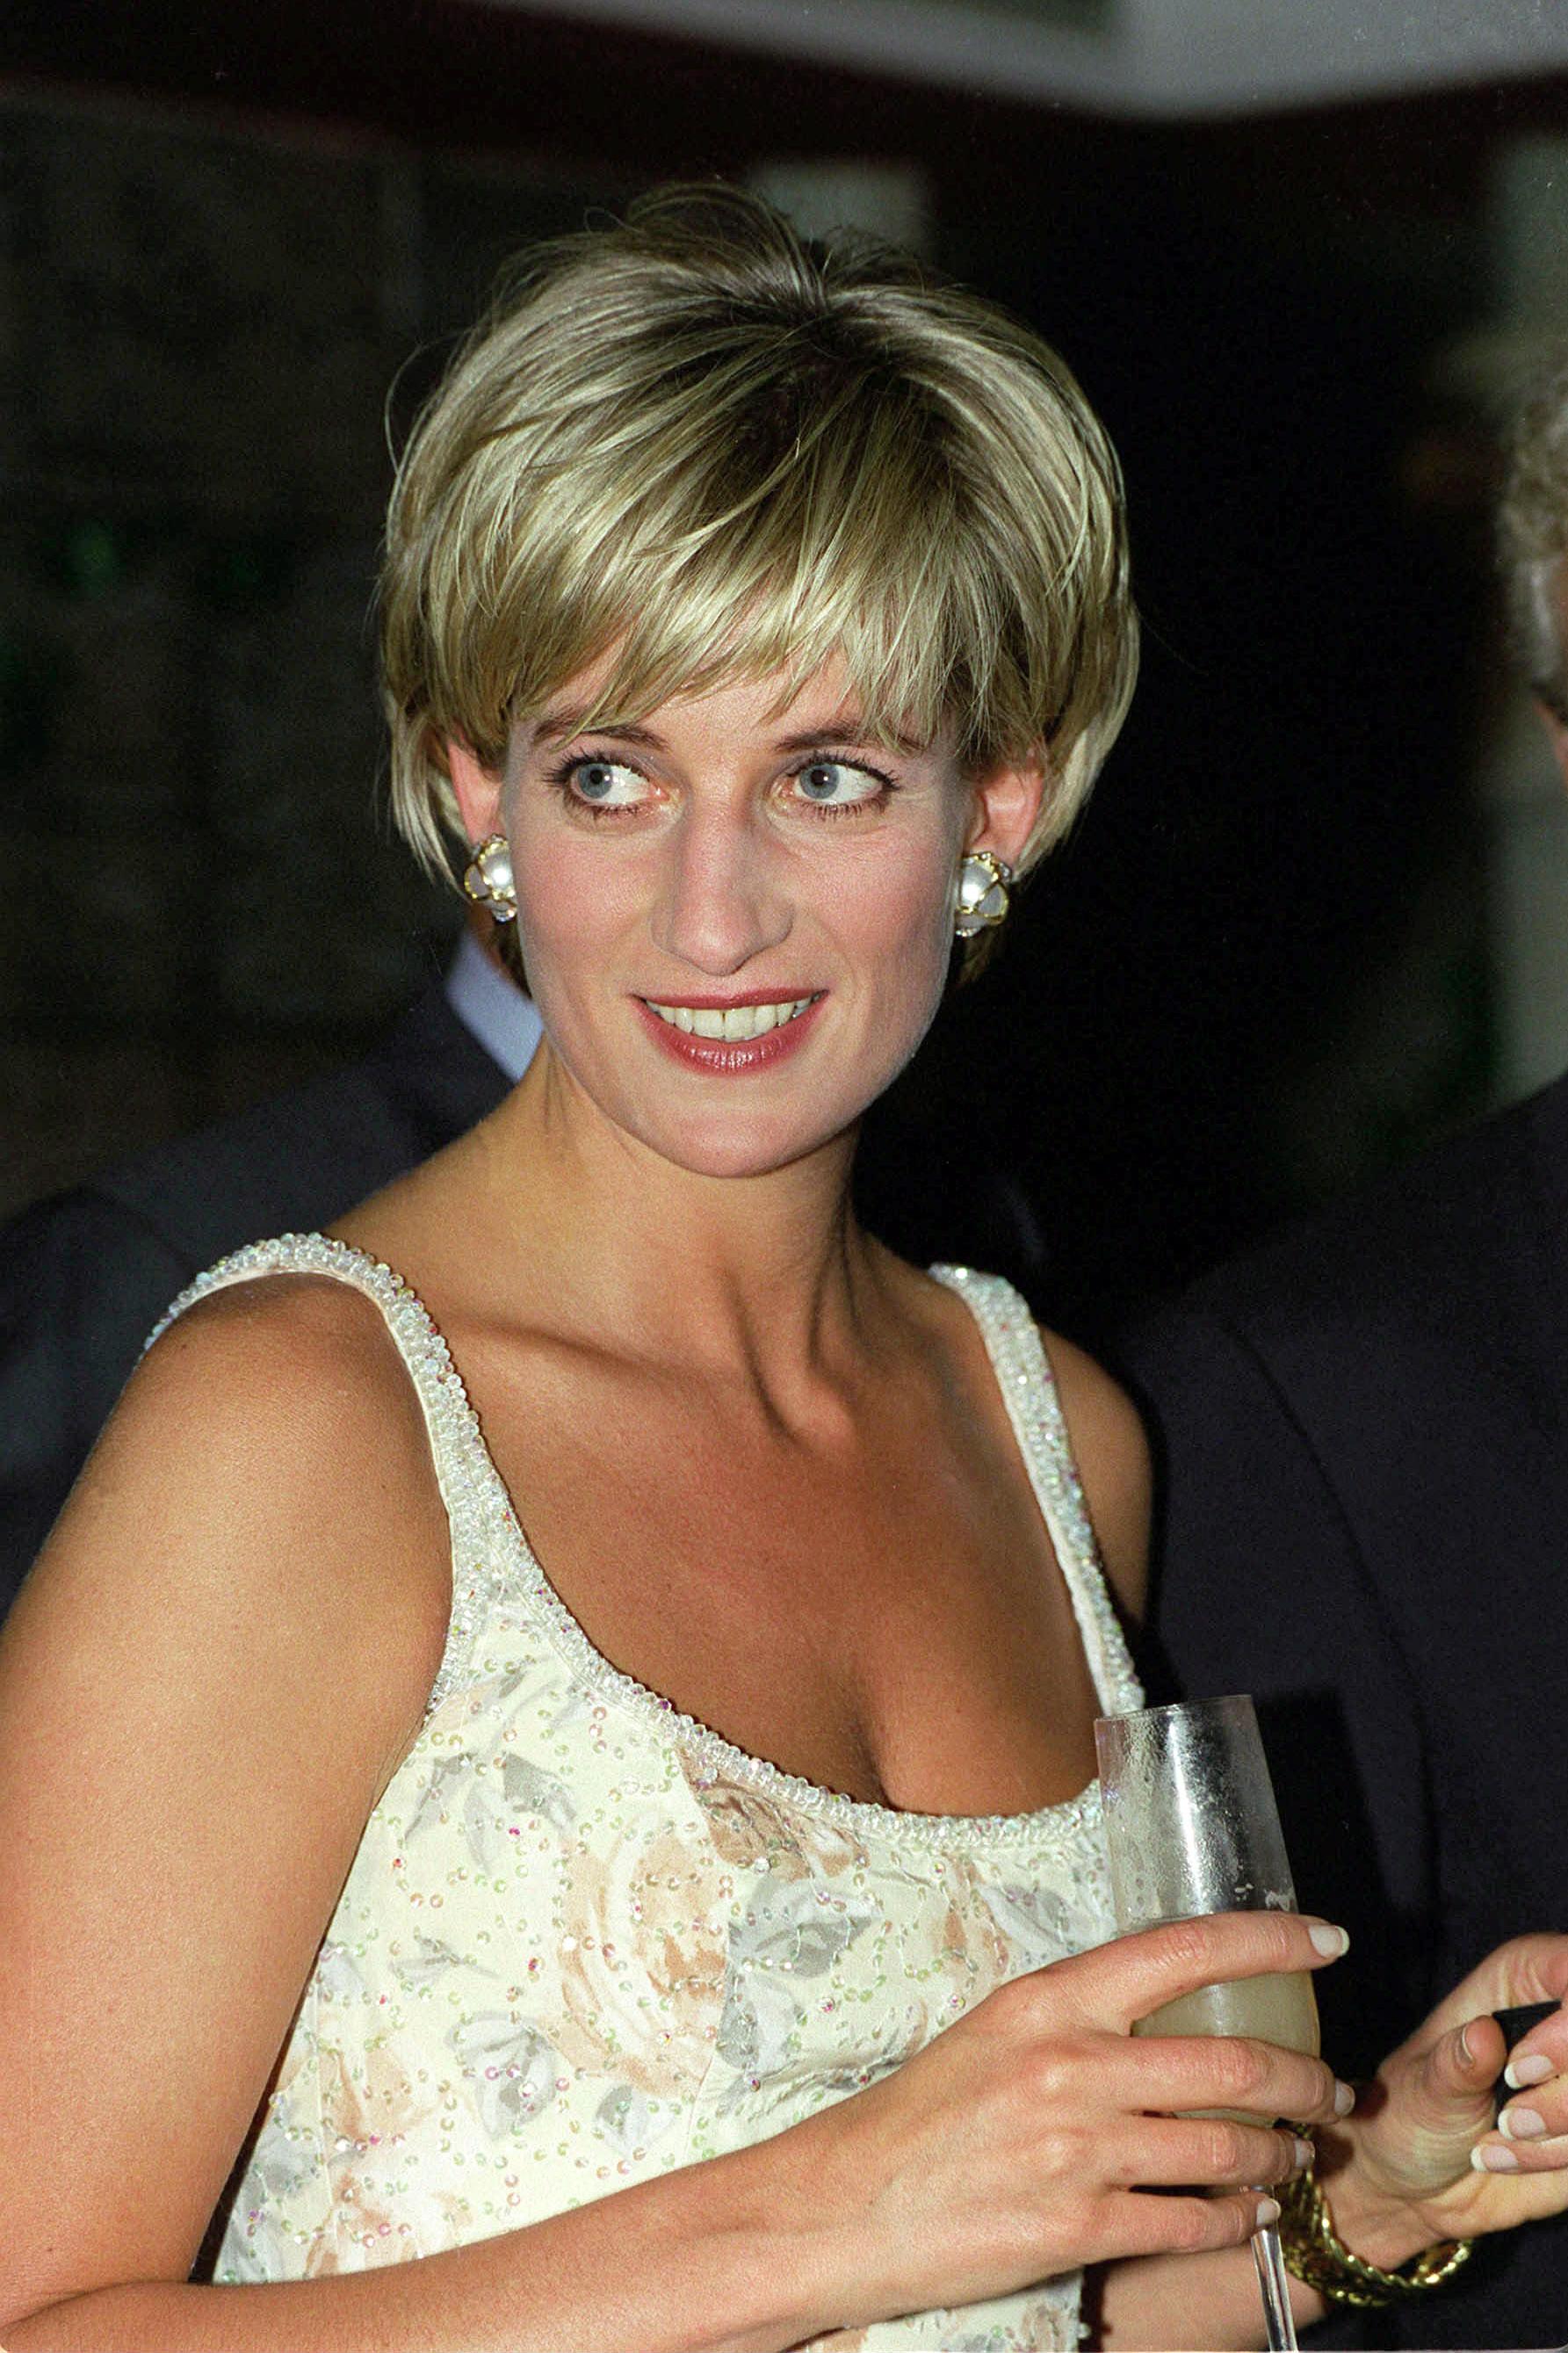 25 Beauty Secrets From Princess Diana - The Royal's Best Makeup ...